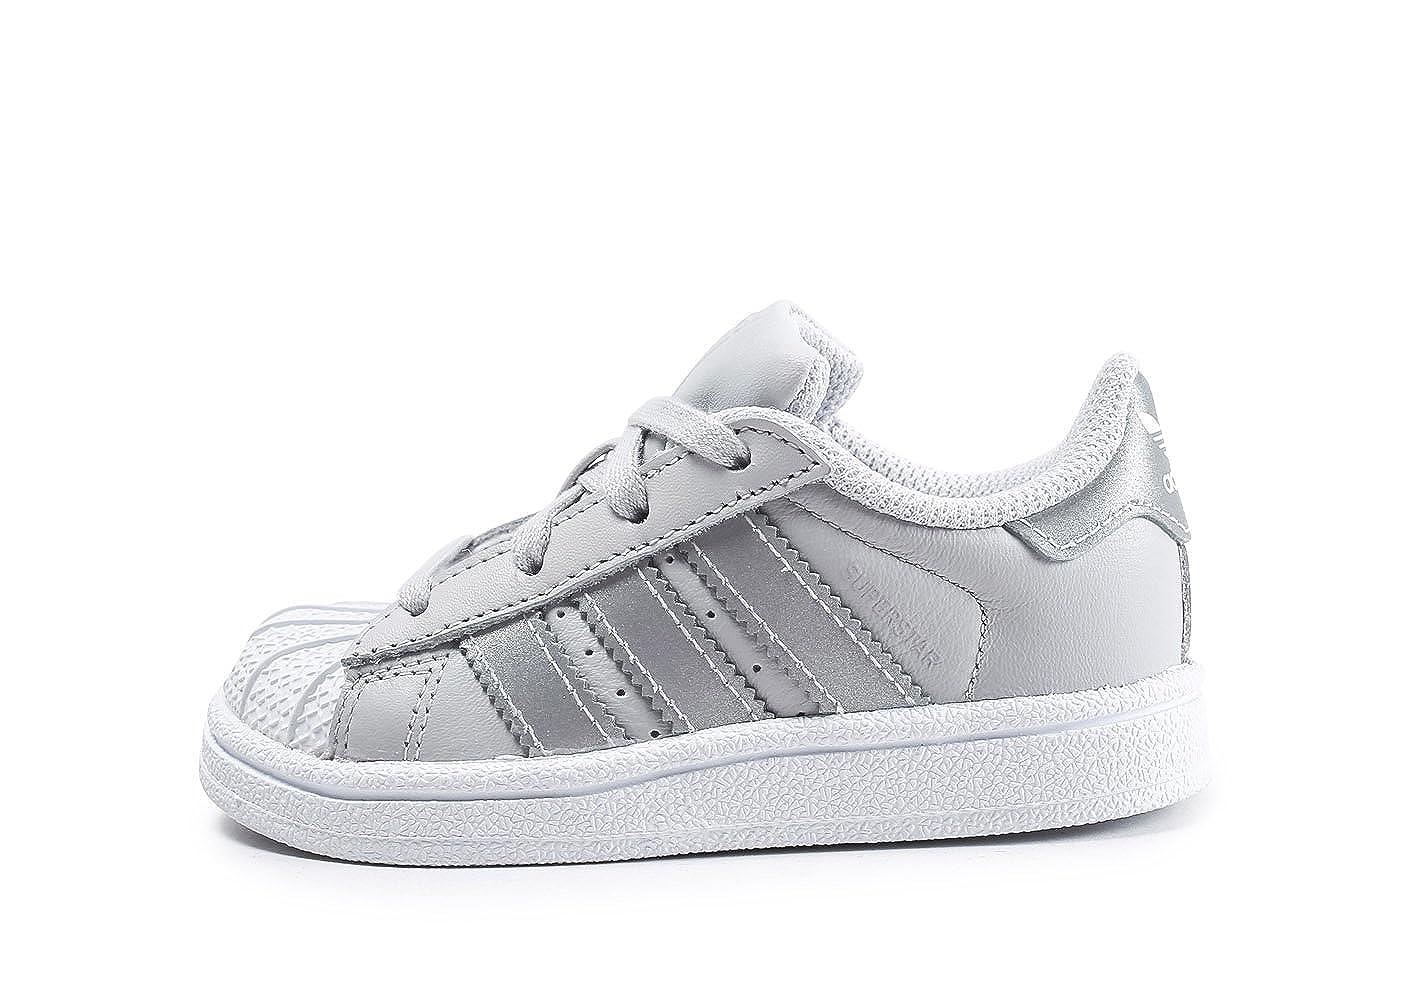 Adidas Superstar I, Chaussons Mixte bé bé , Gris (Grpulg/Plamet/Ftwbla 000), 20 EU Chaussons Mixte bébé CQ2855